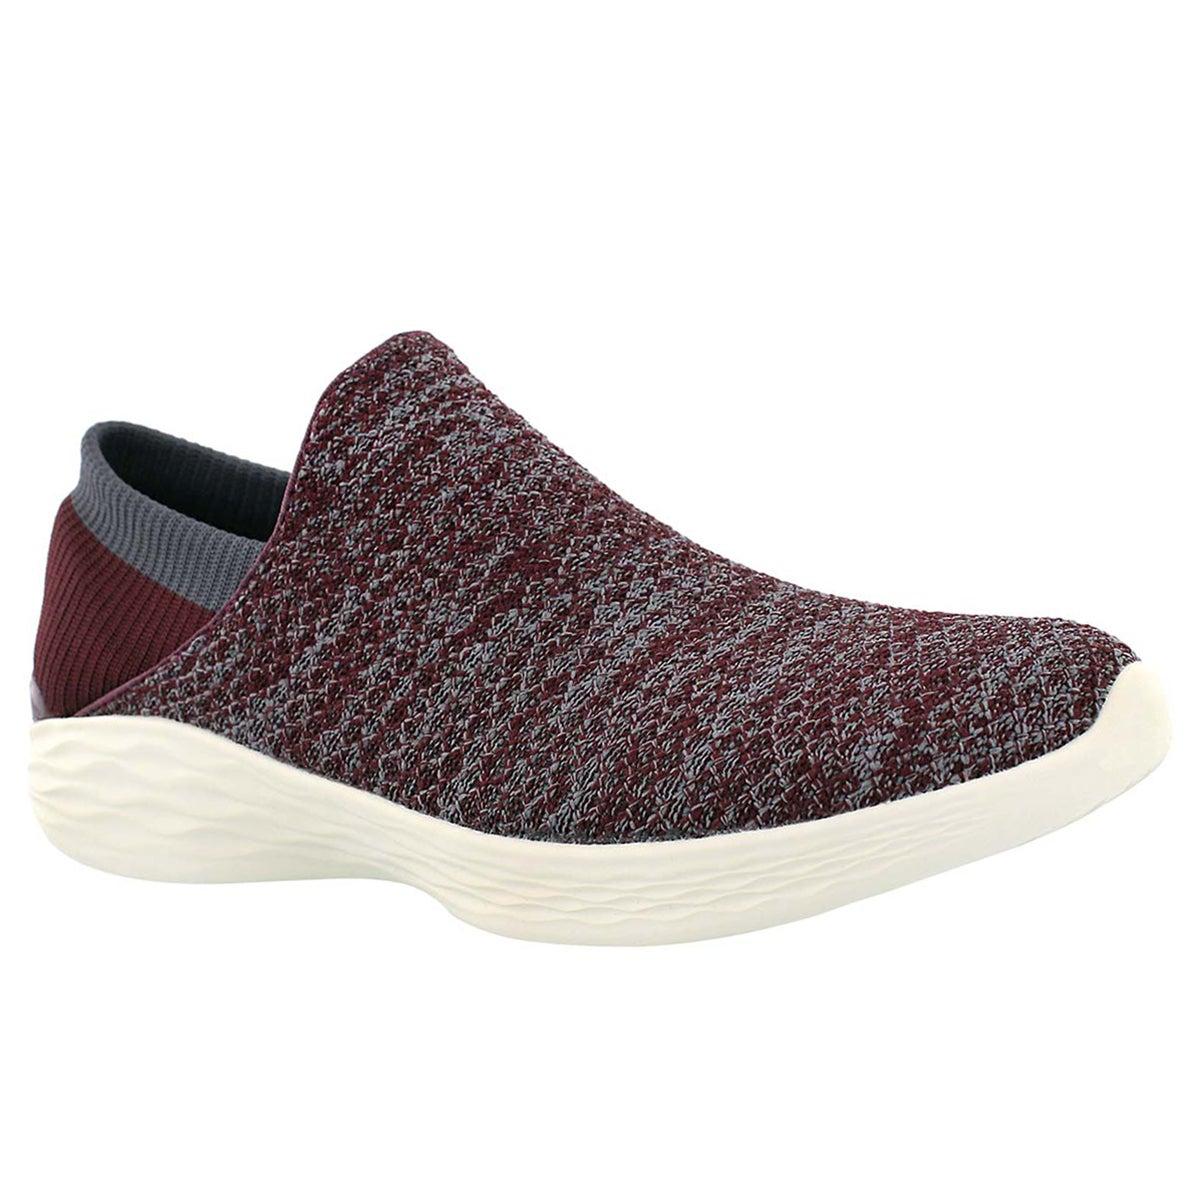 Women's YOU burgundy slip on walking shoes